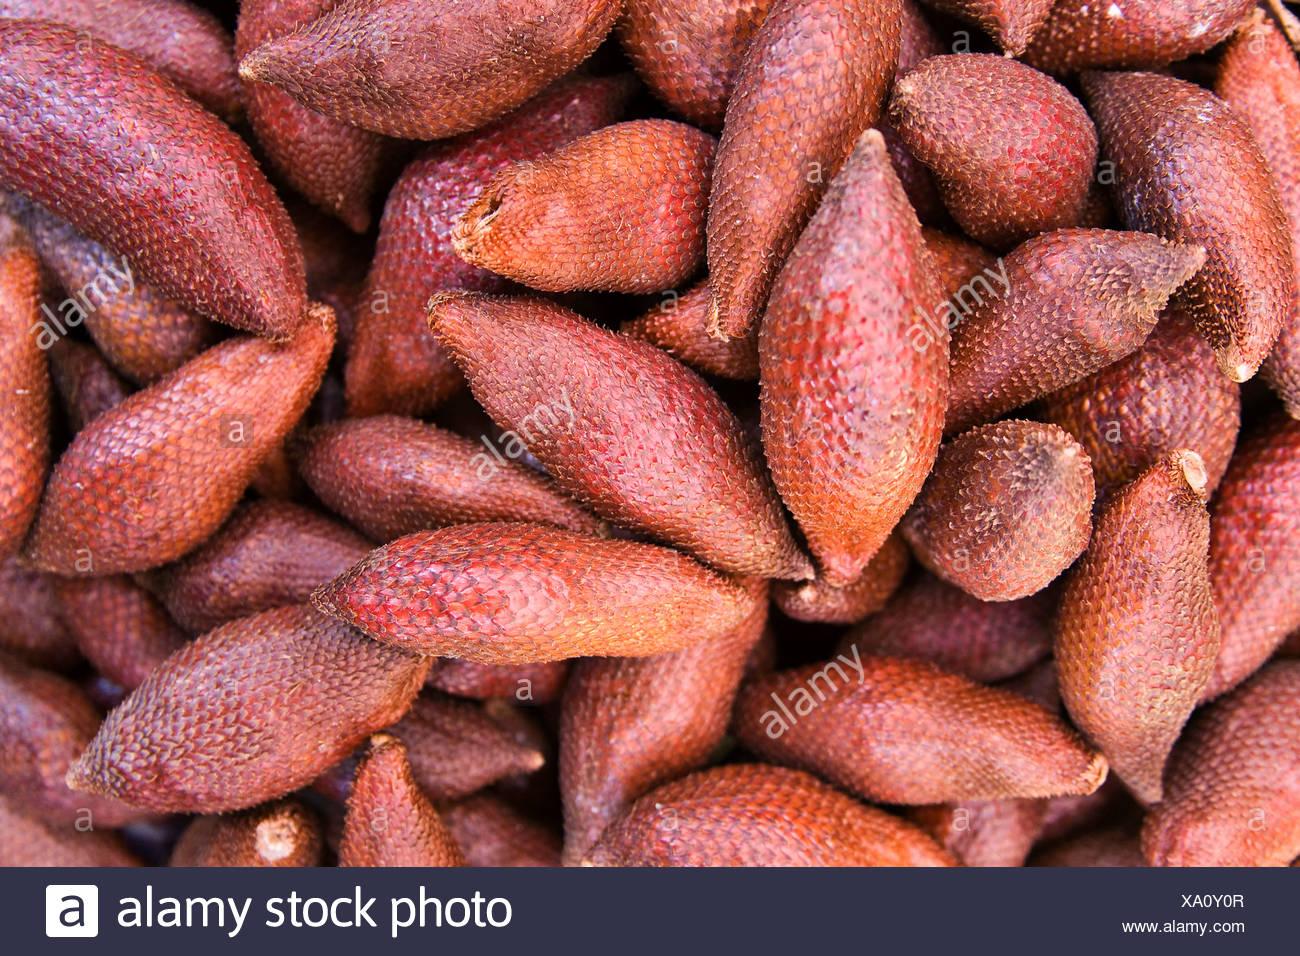 Salak Fruit or Snake Fruit (Salacca zalacca) - Stock Image